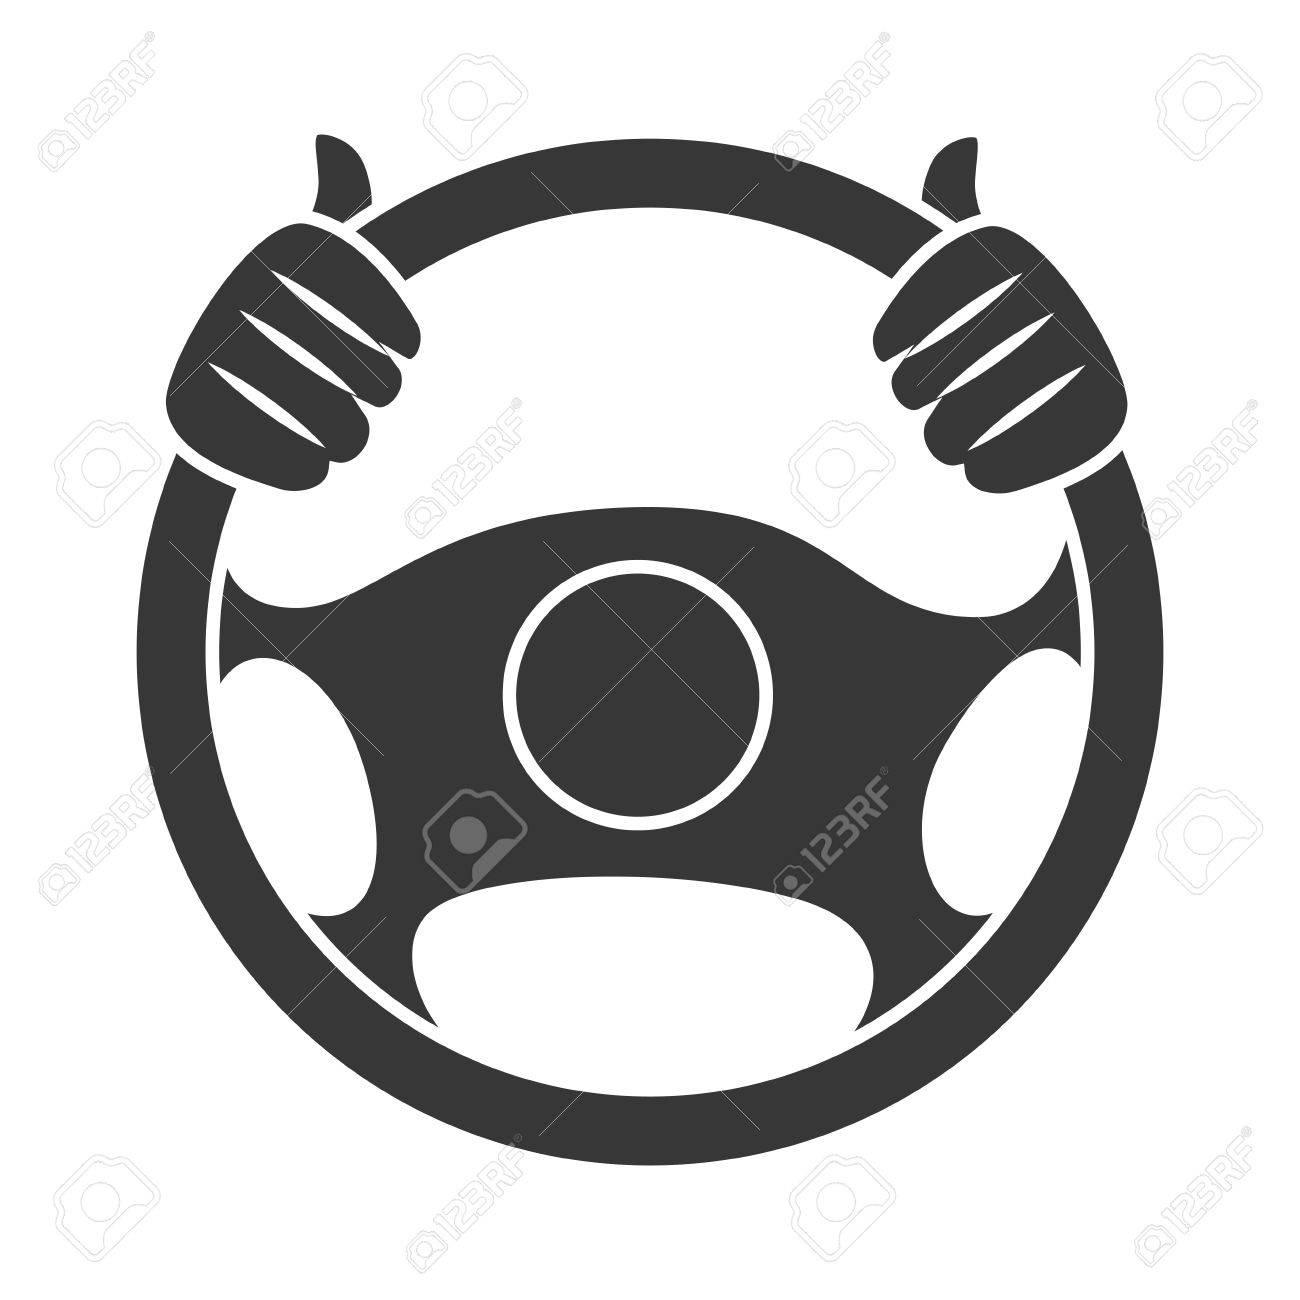 564 Steering Wheel free clipart.